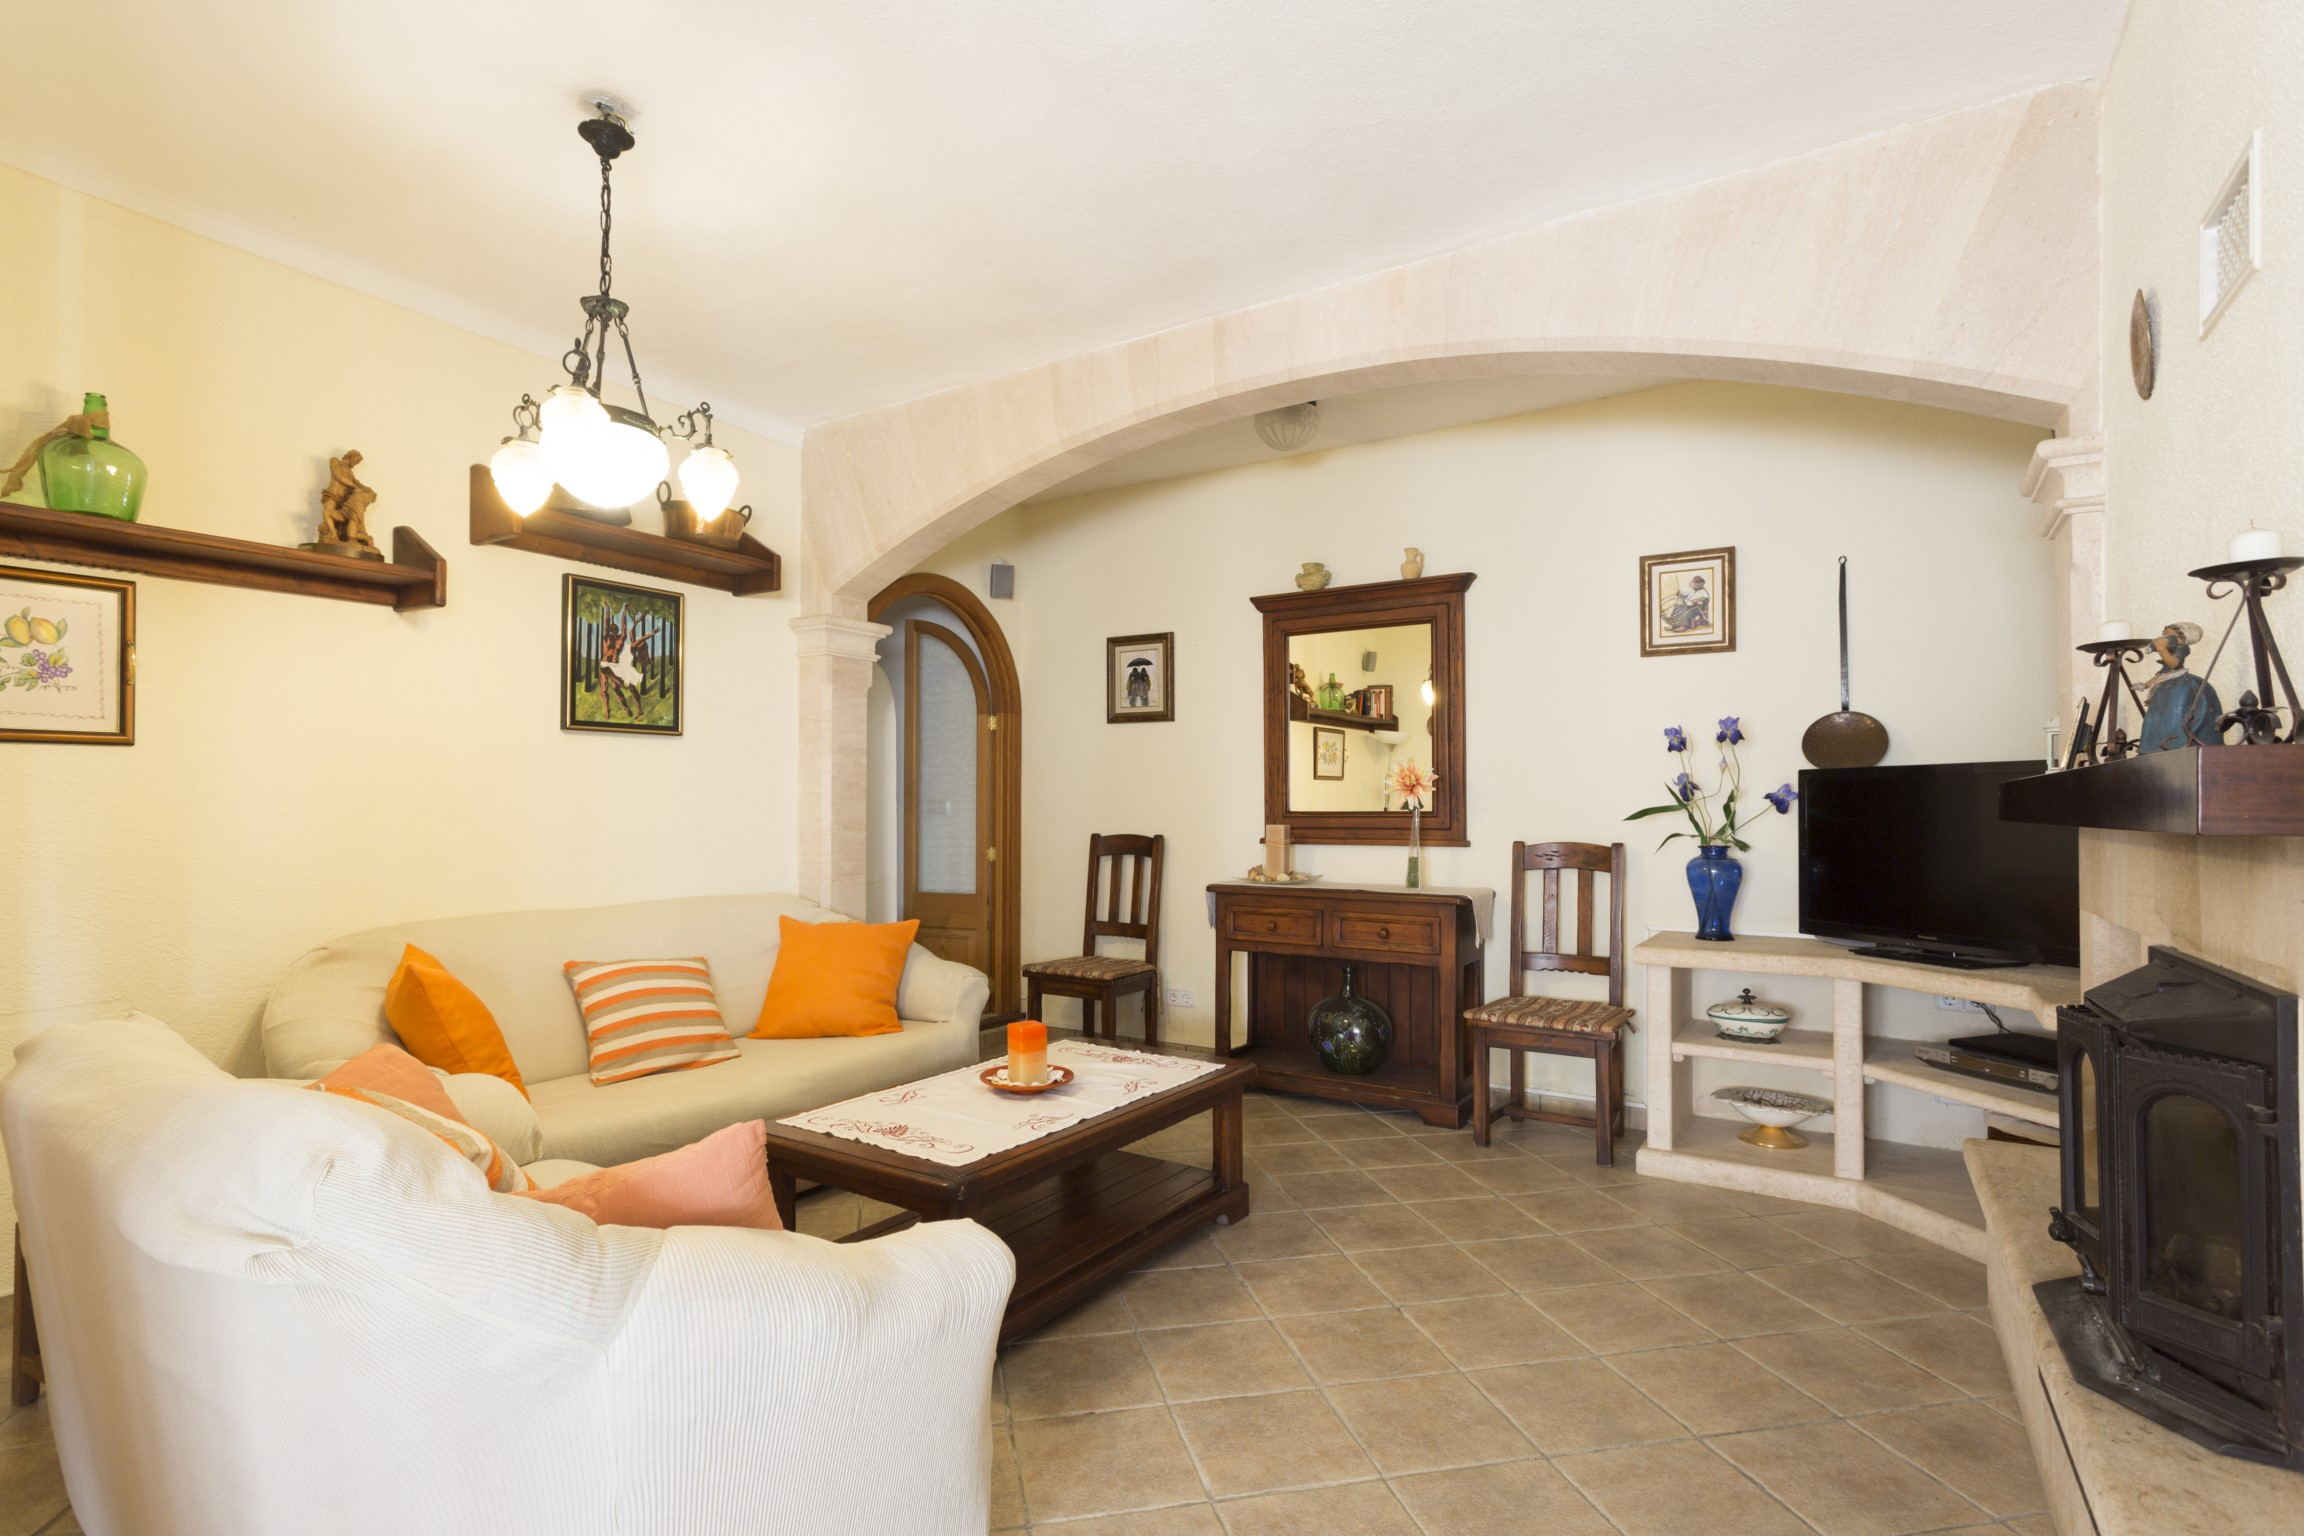 Ferienhaus SON CIGALA (1859655), Petra (ES), Mallorca, Balearische Inseln, Spanien, Bild 9